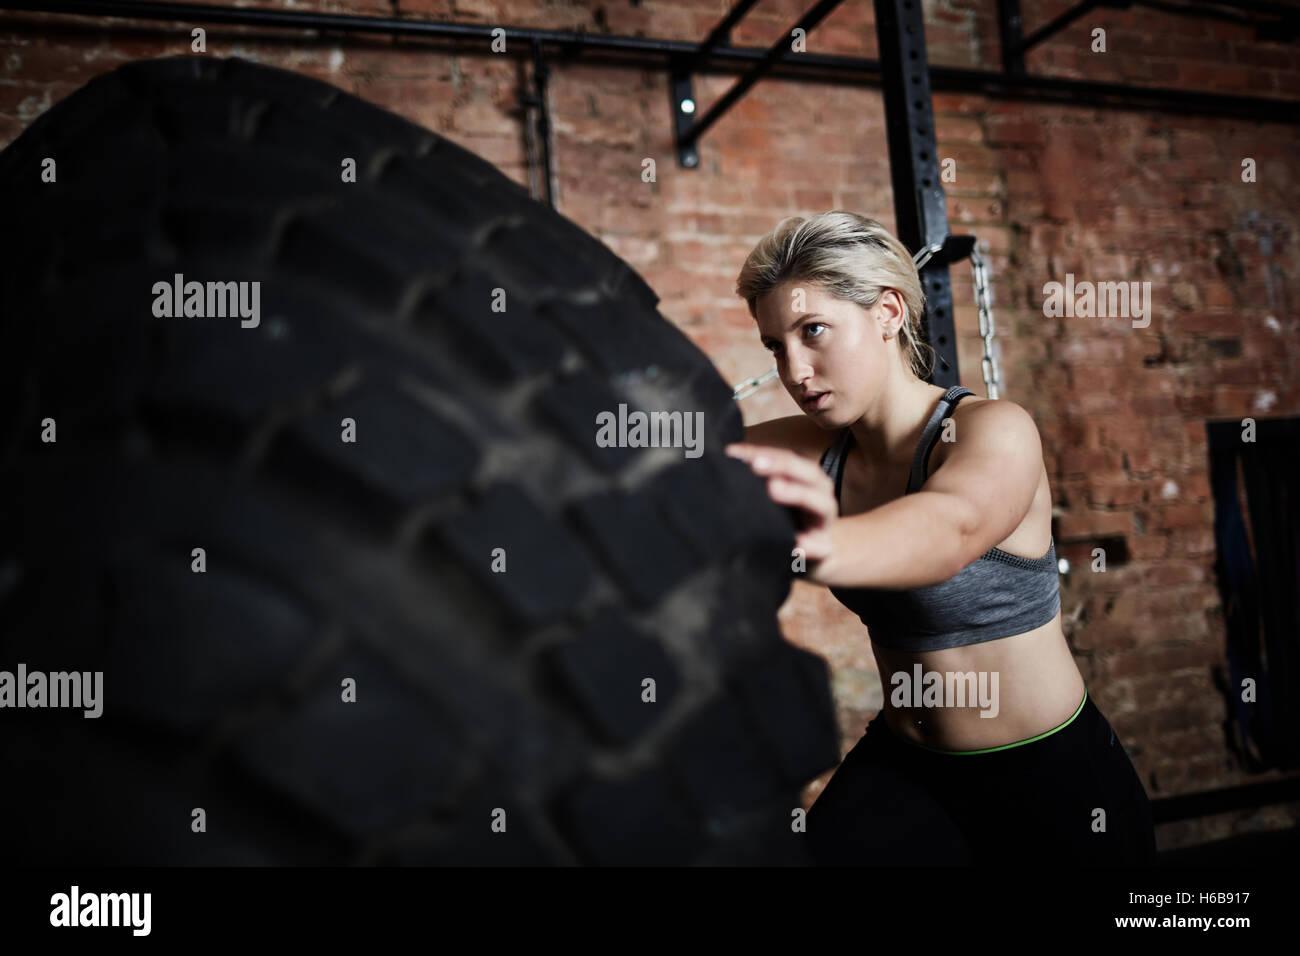 L'exercice avec un pneumatique Photo Stock